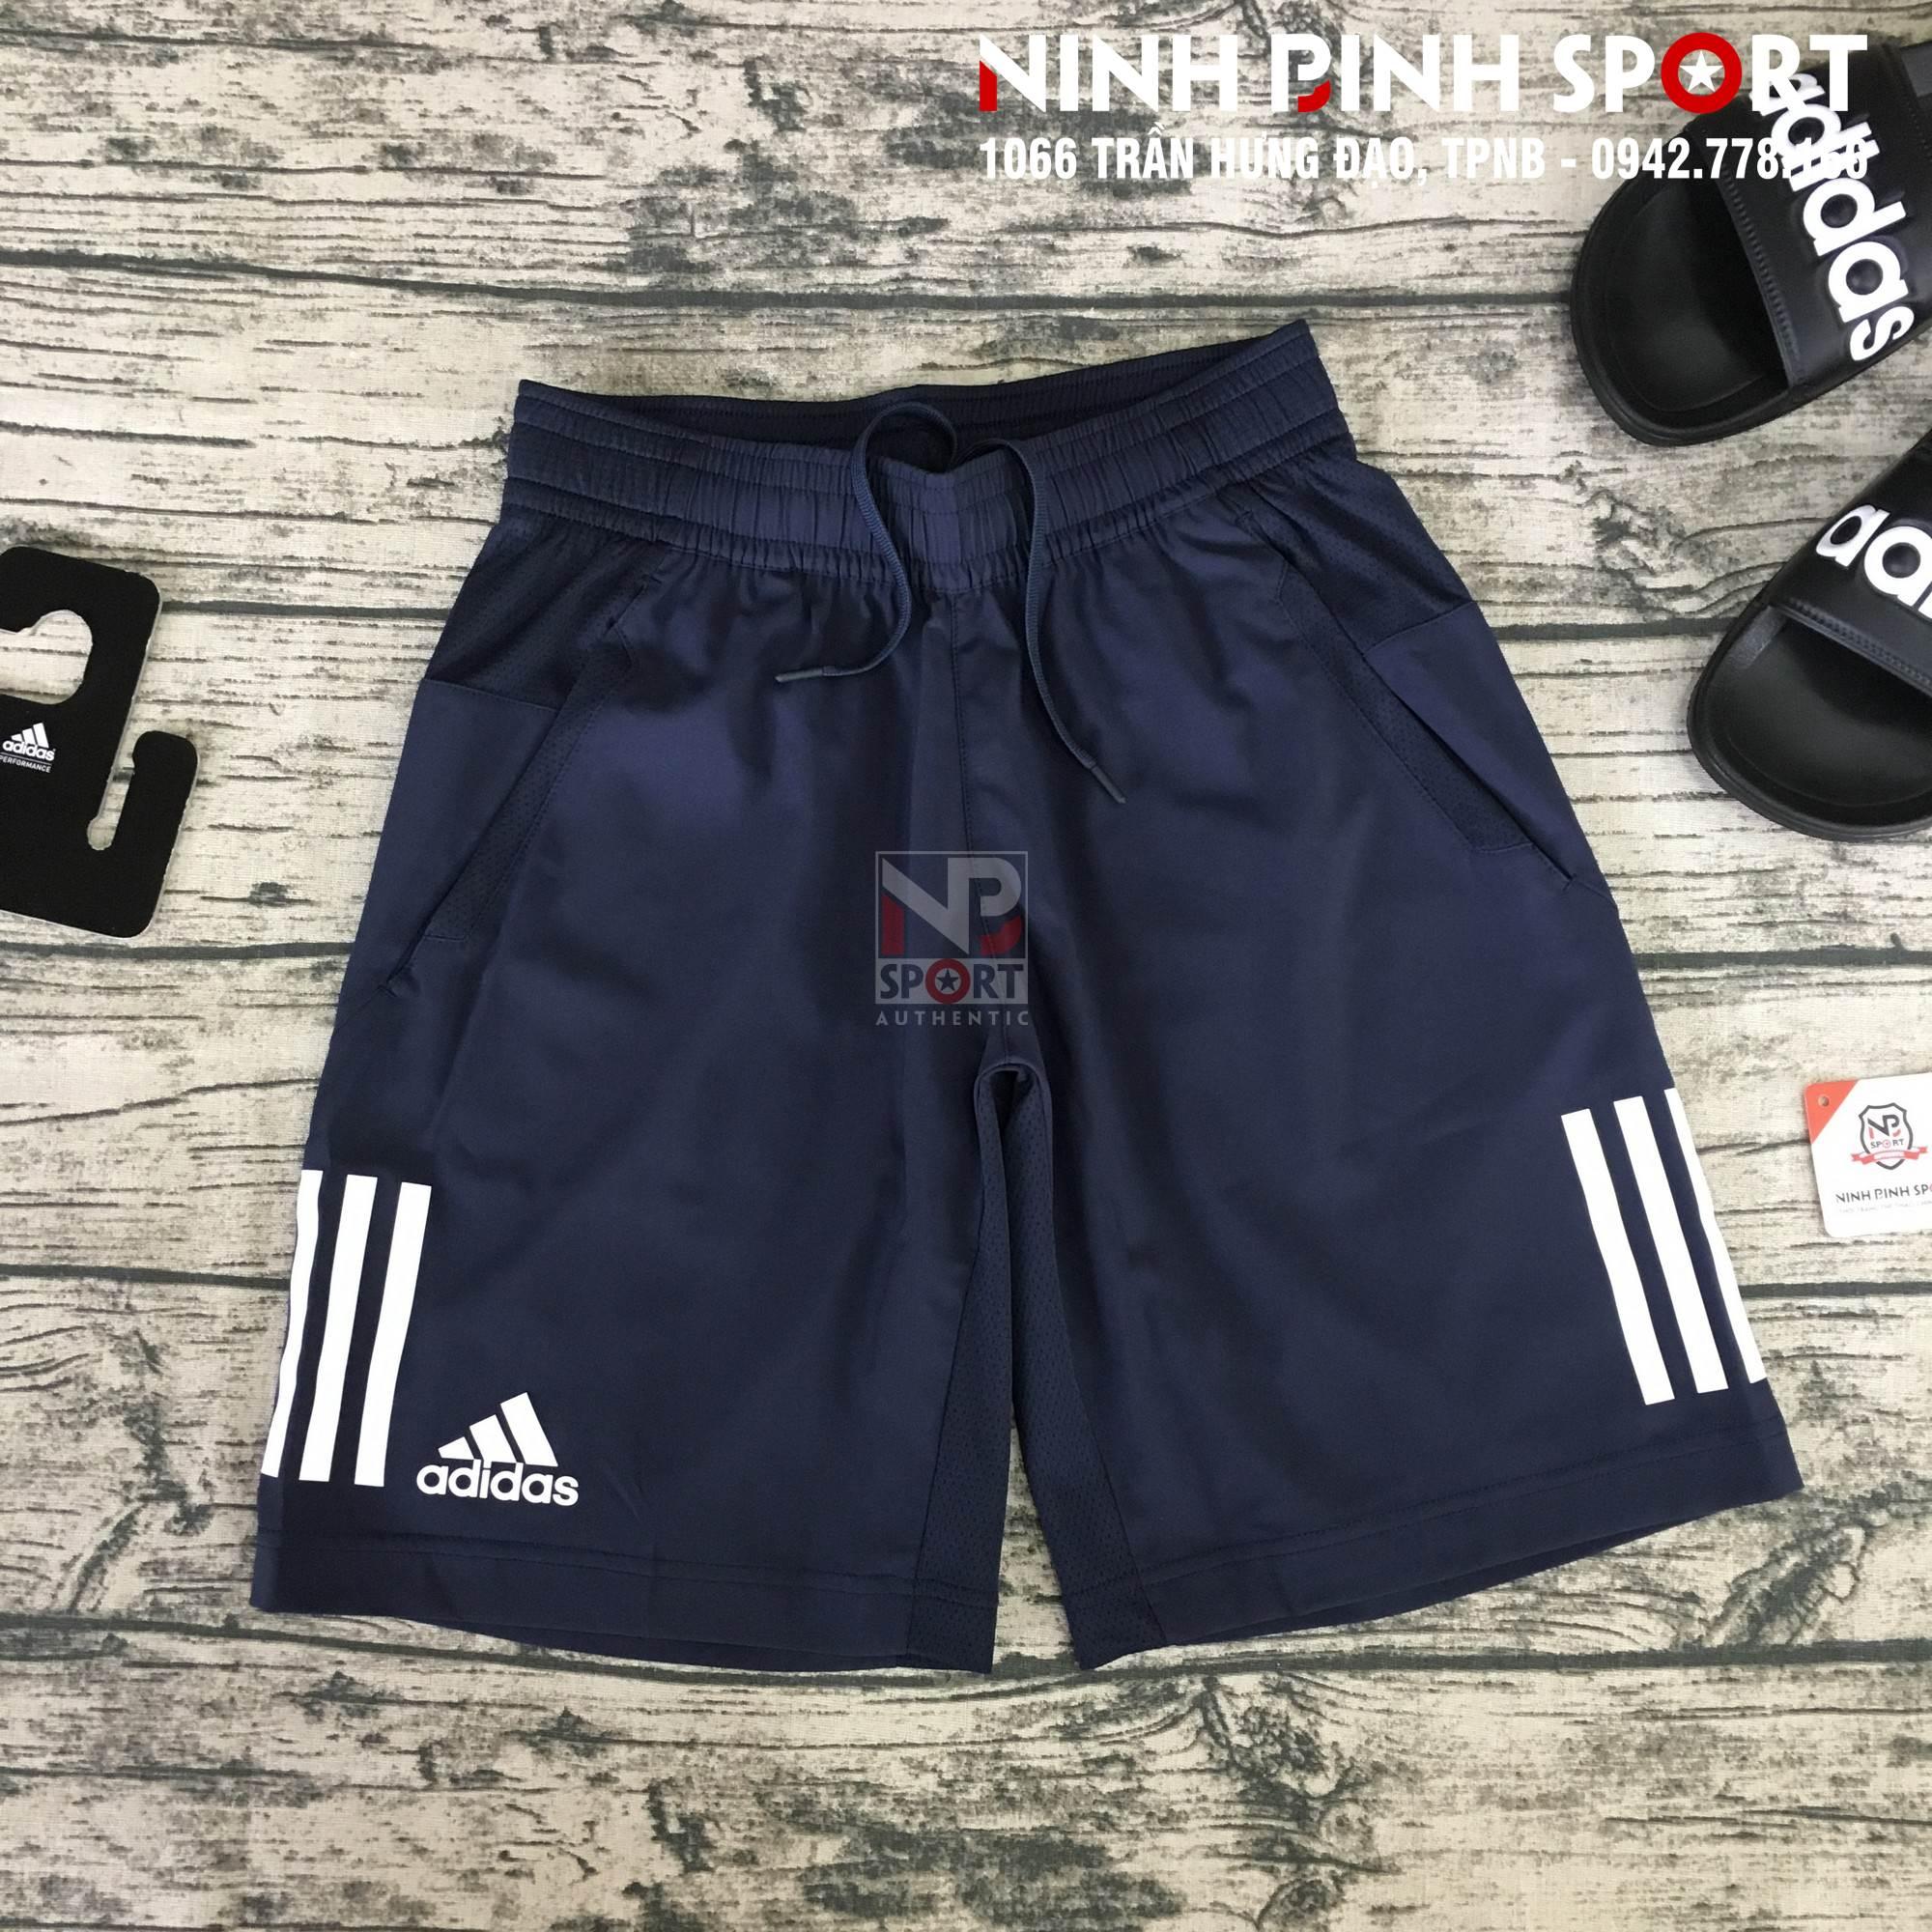 Quần thể thao nam Adidas 3-Stripes Club Short D93660